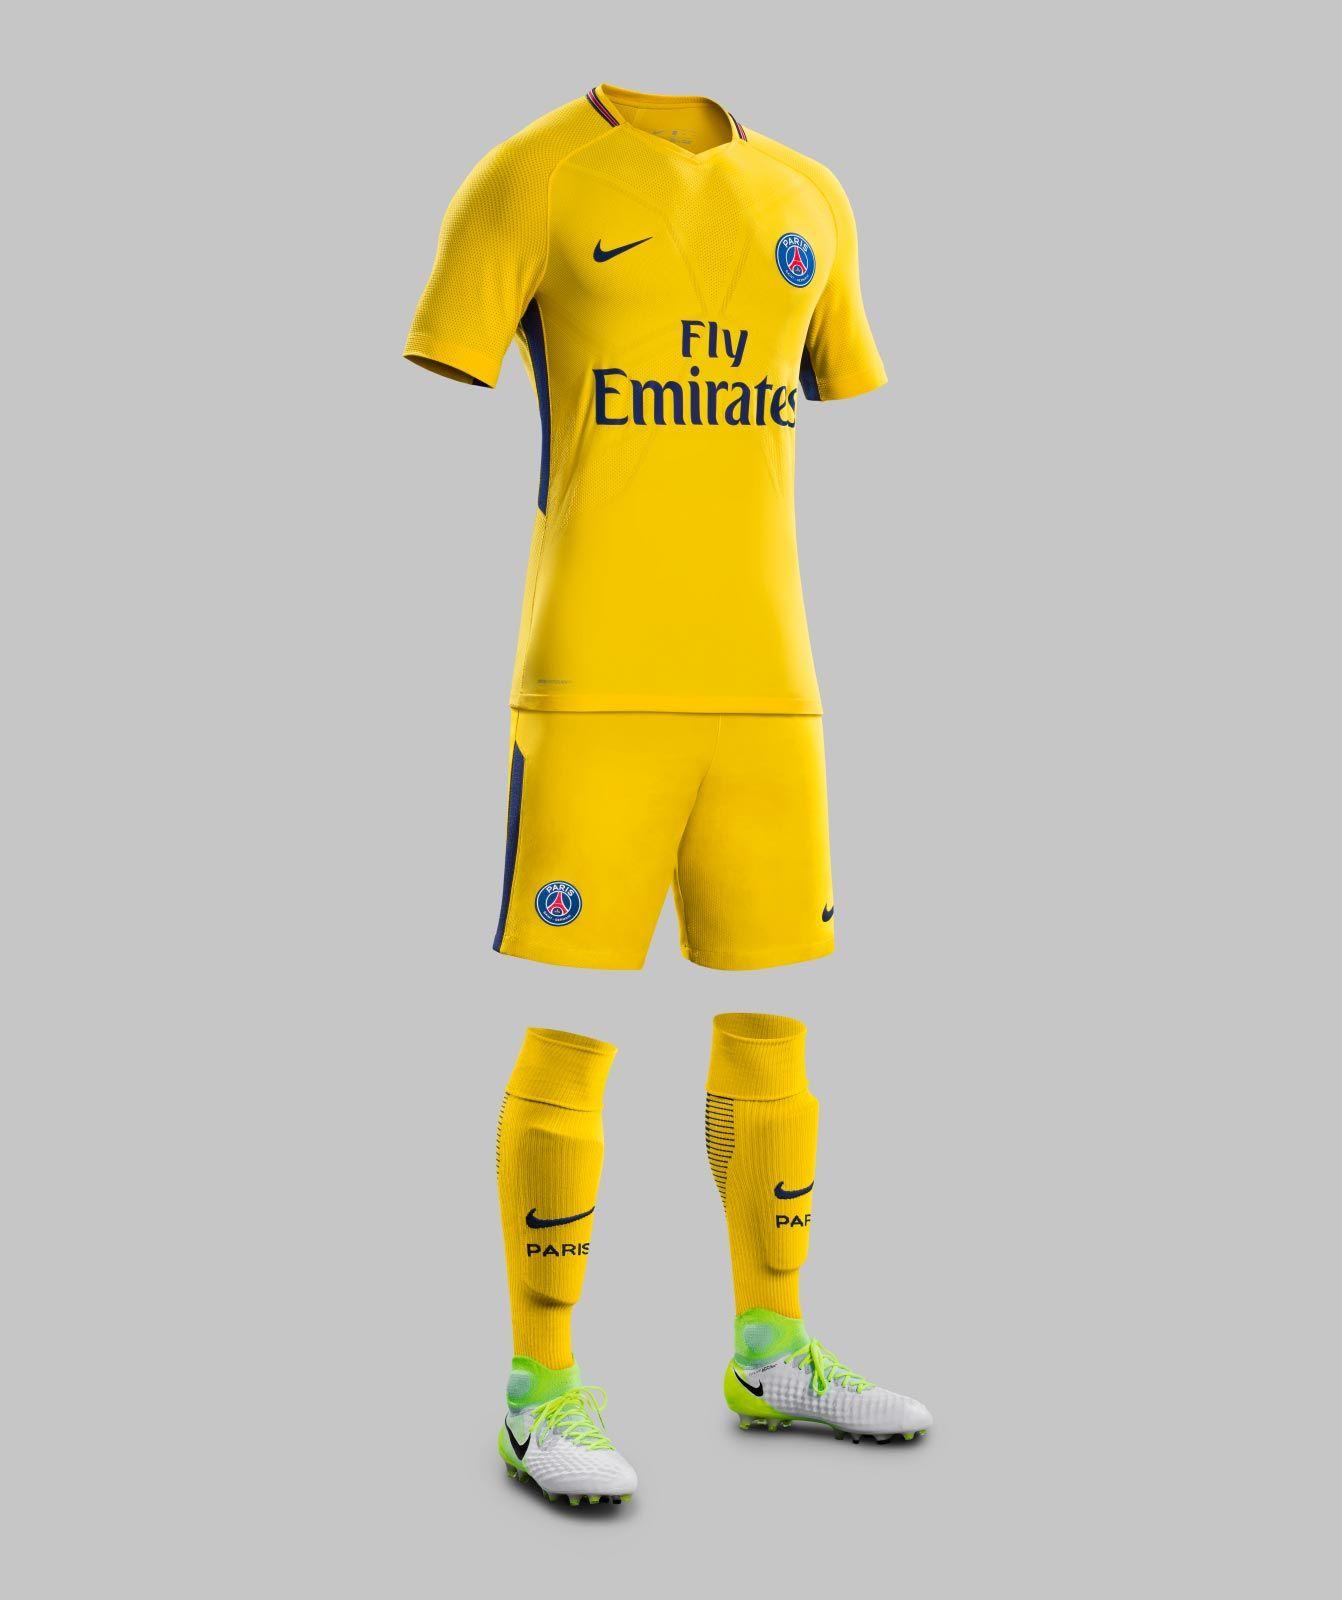 The new Paris Saint-Germain 2017-2018 away jersey is yellow d7939c52d